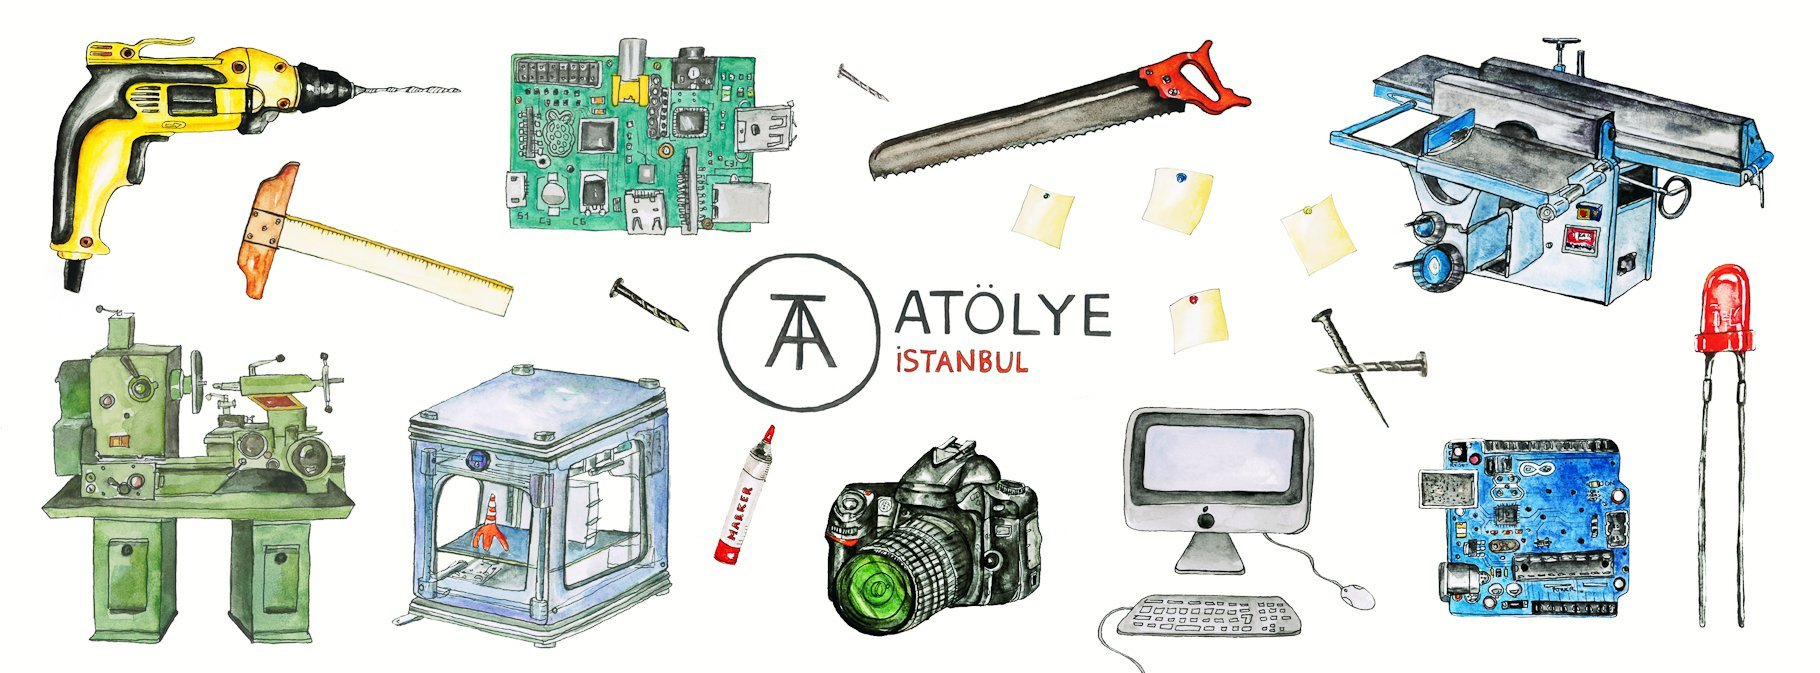 atolye-illustration1